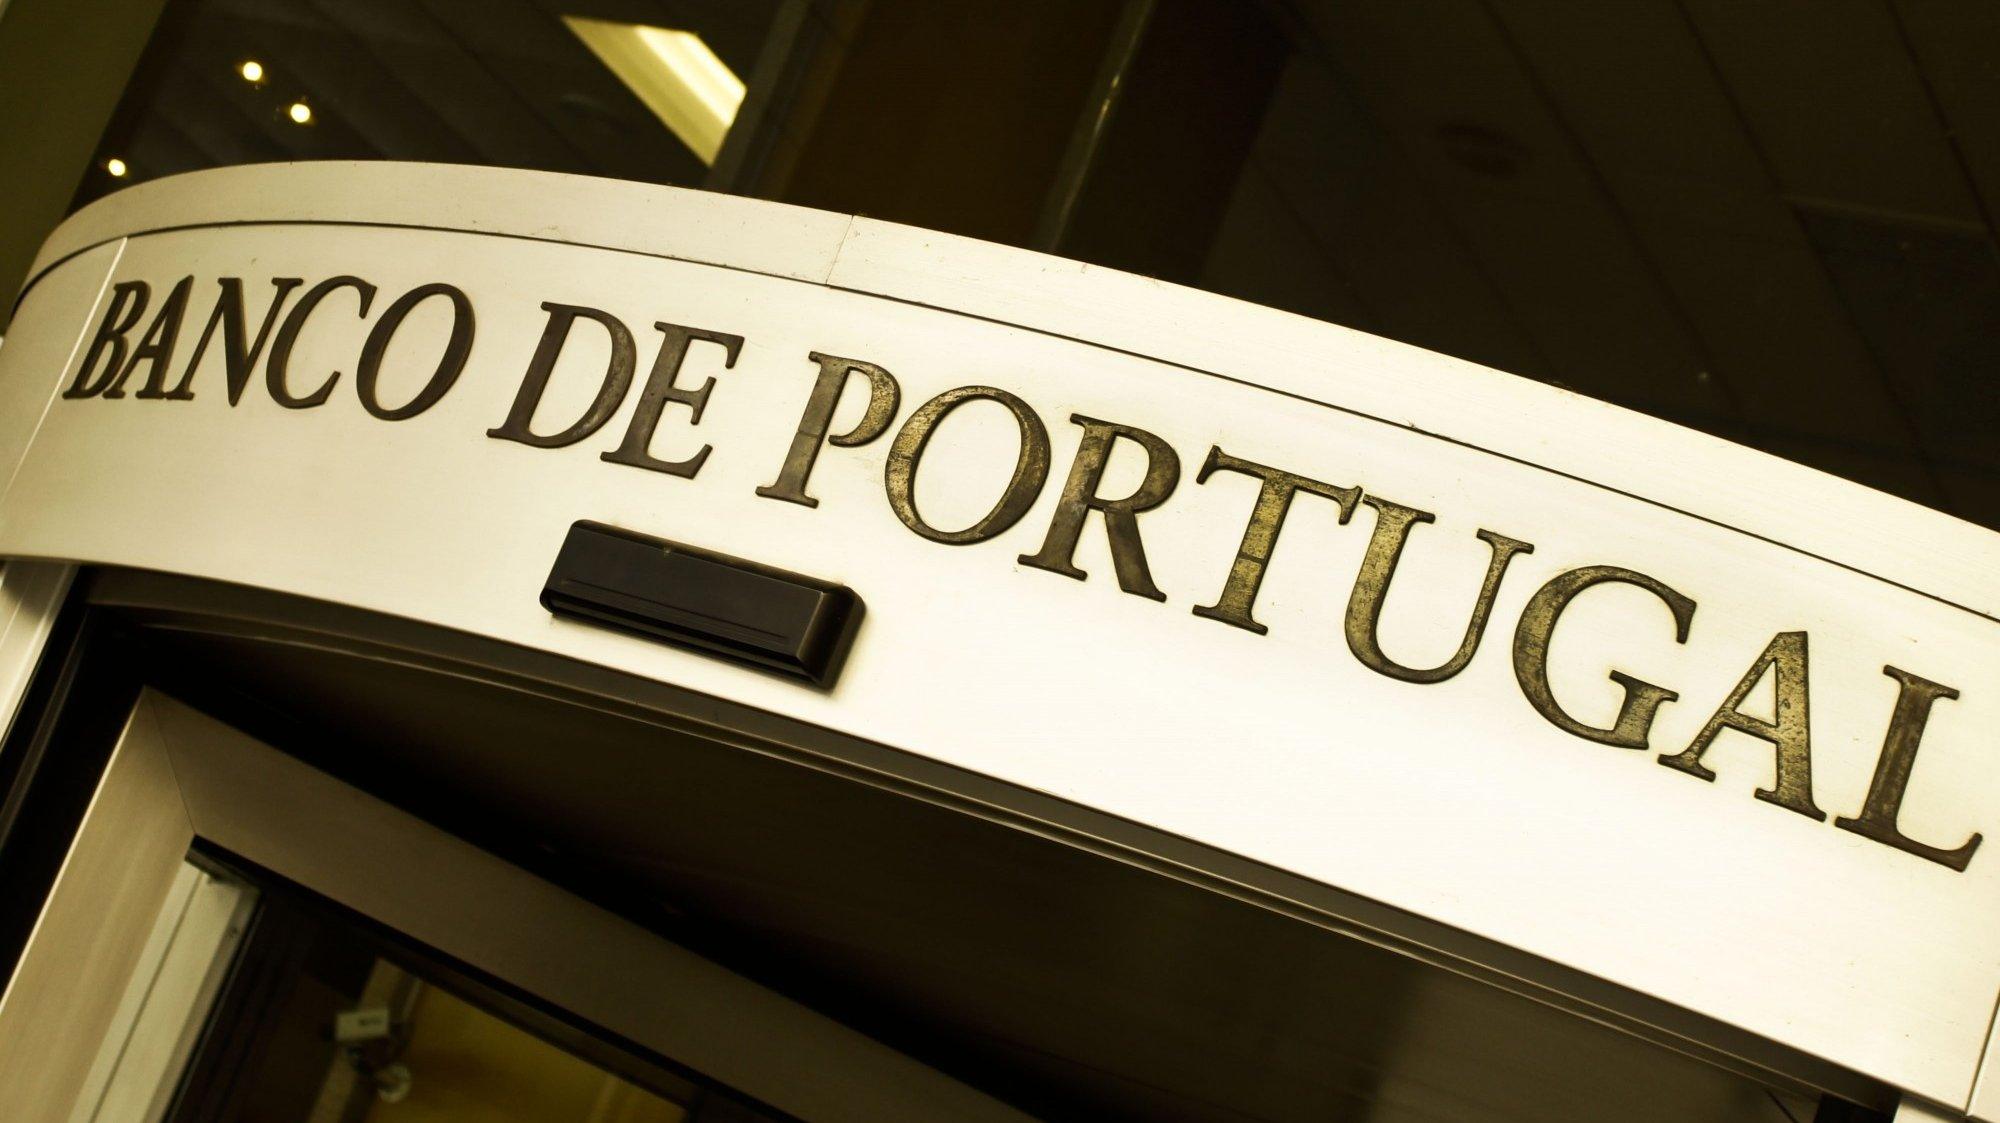 Banco de Portugal